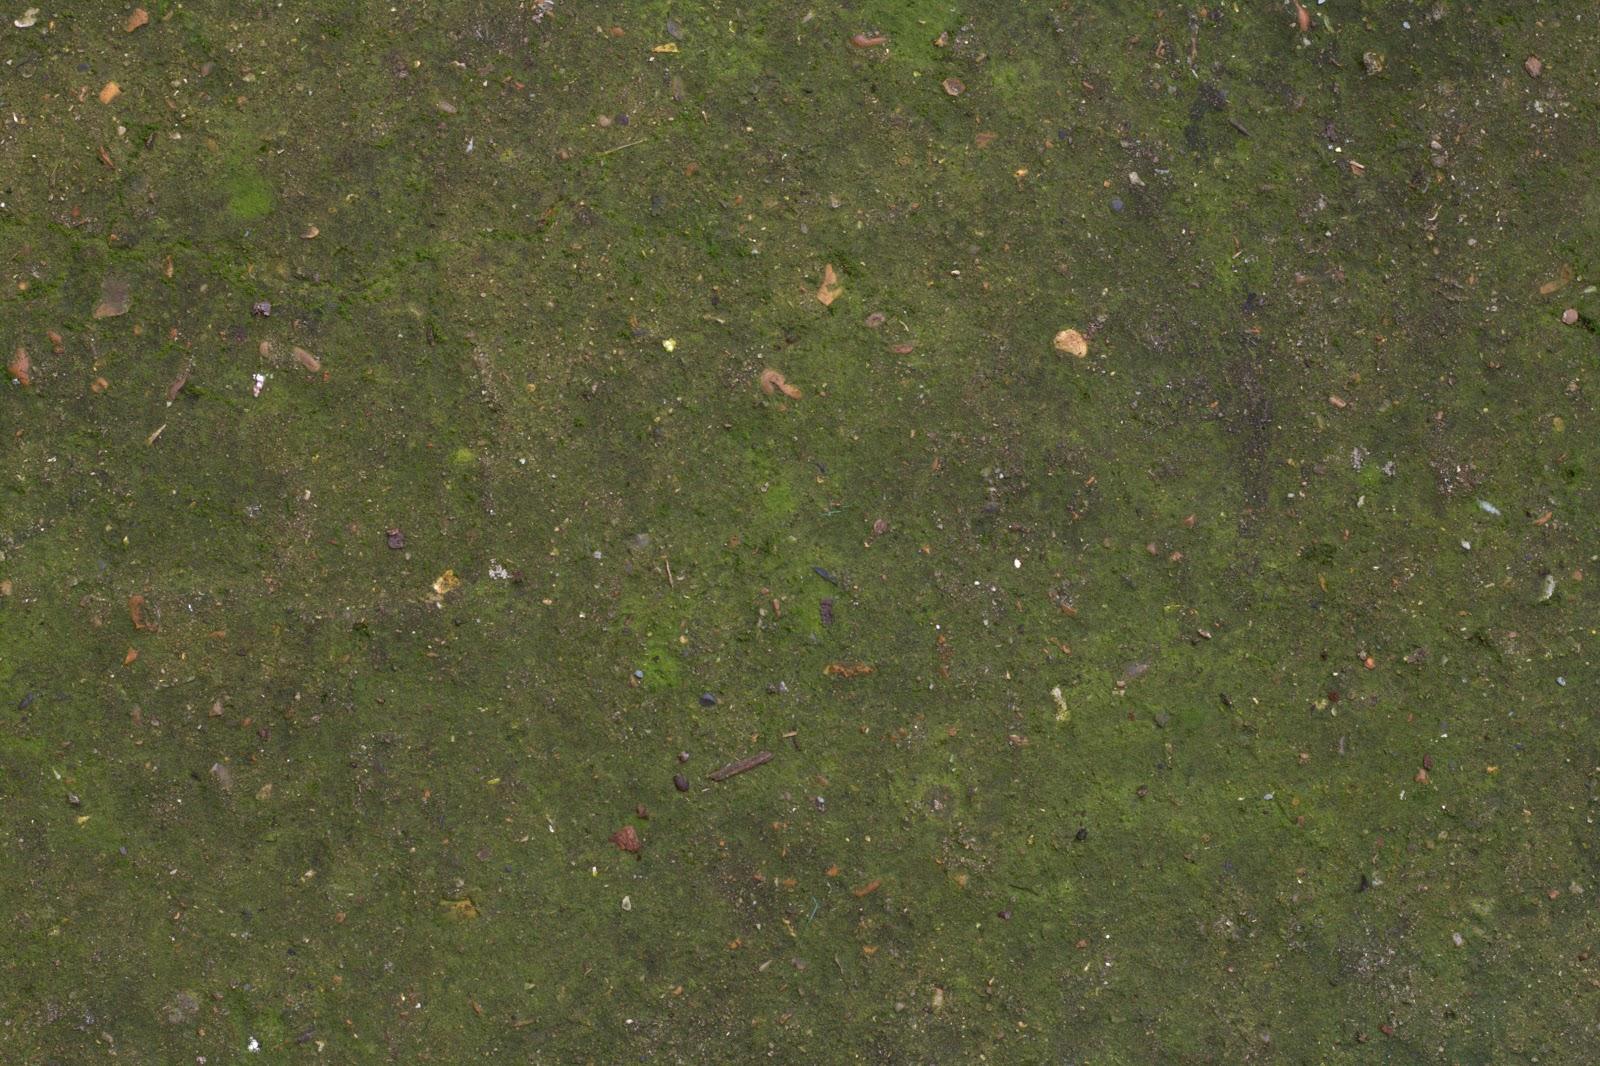 Concrete floor moss dirt texture 4770x3178